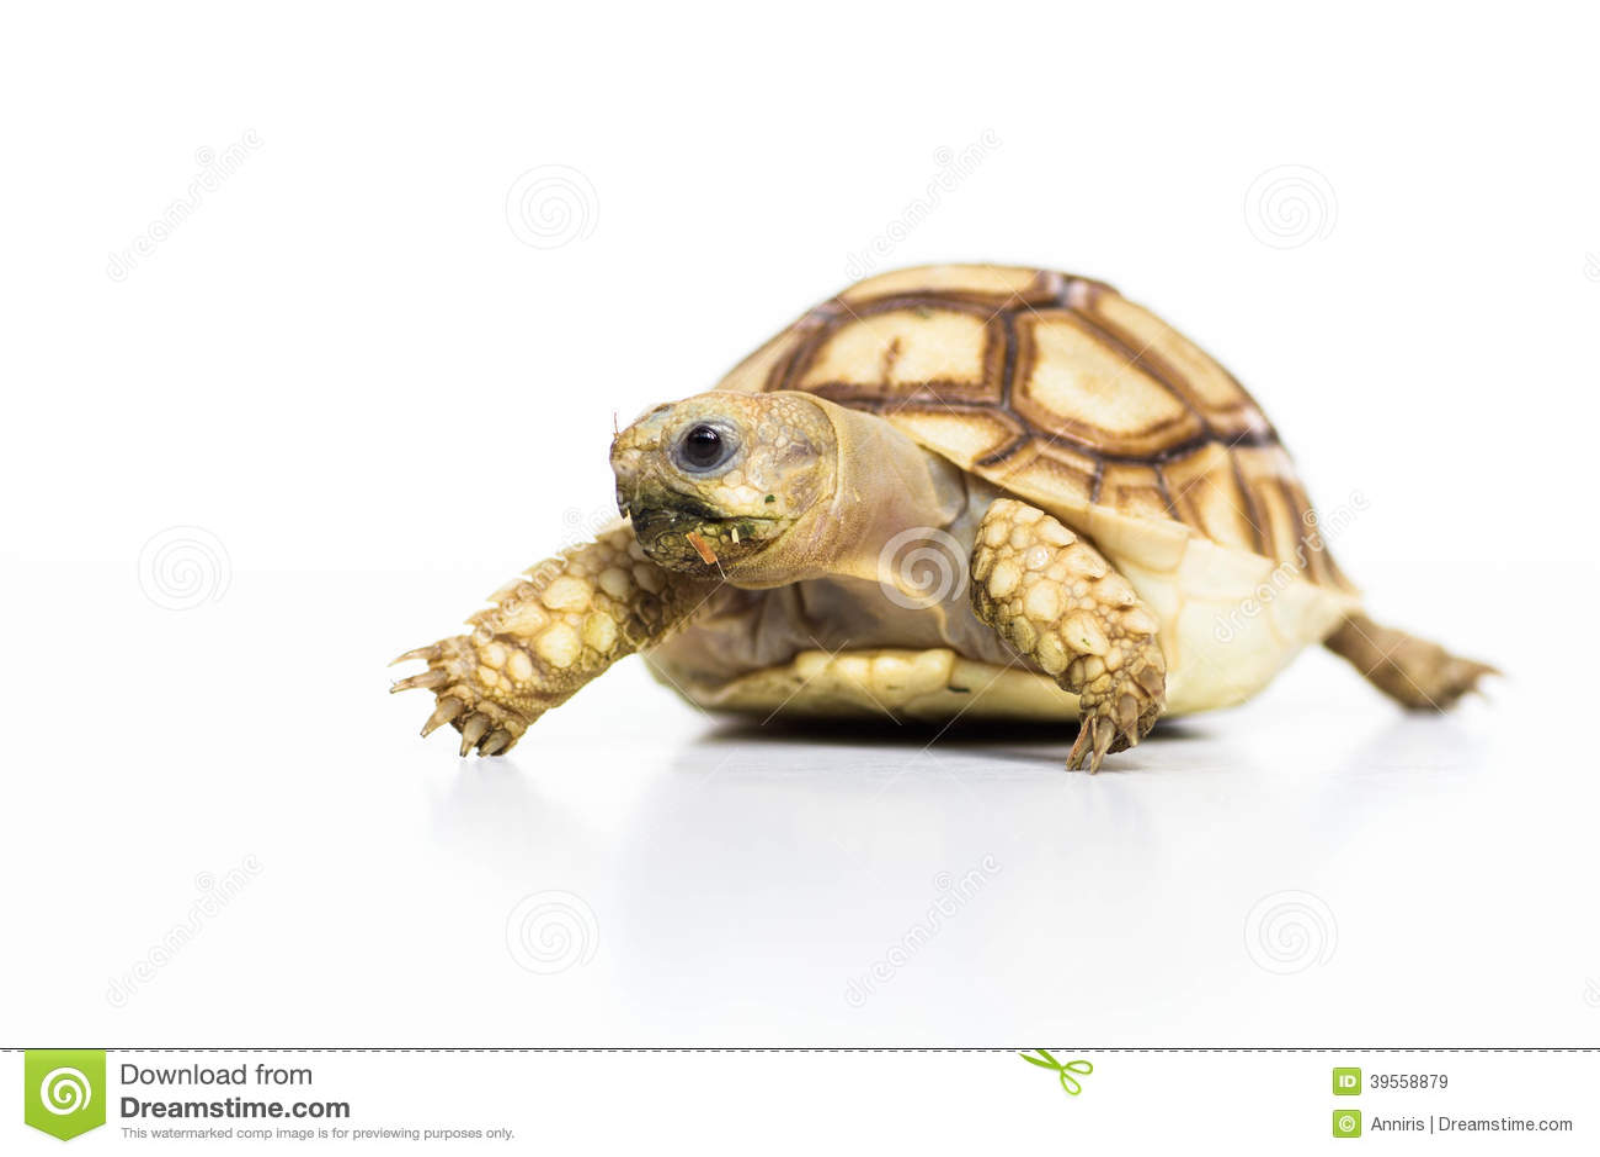 Tortoise Pet Turtle Stock Photo - Image: 39558879